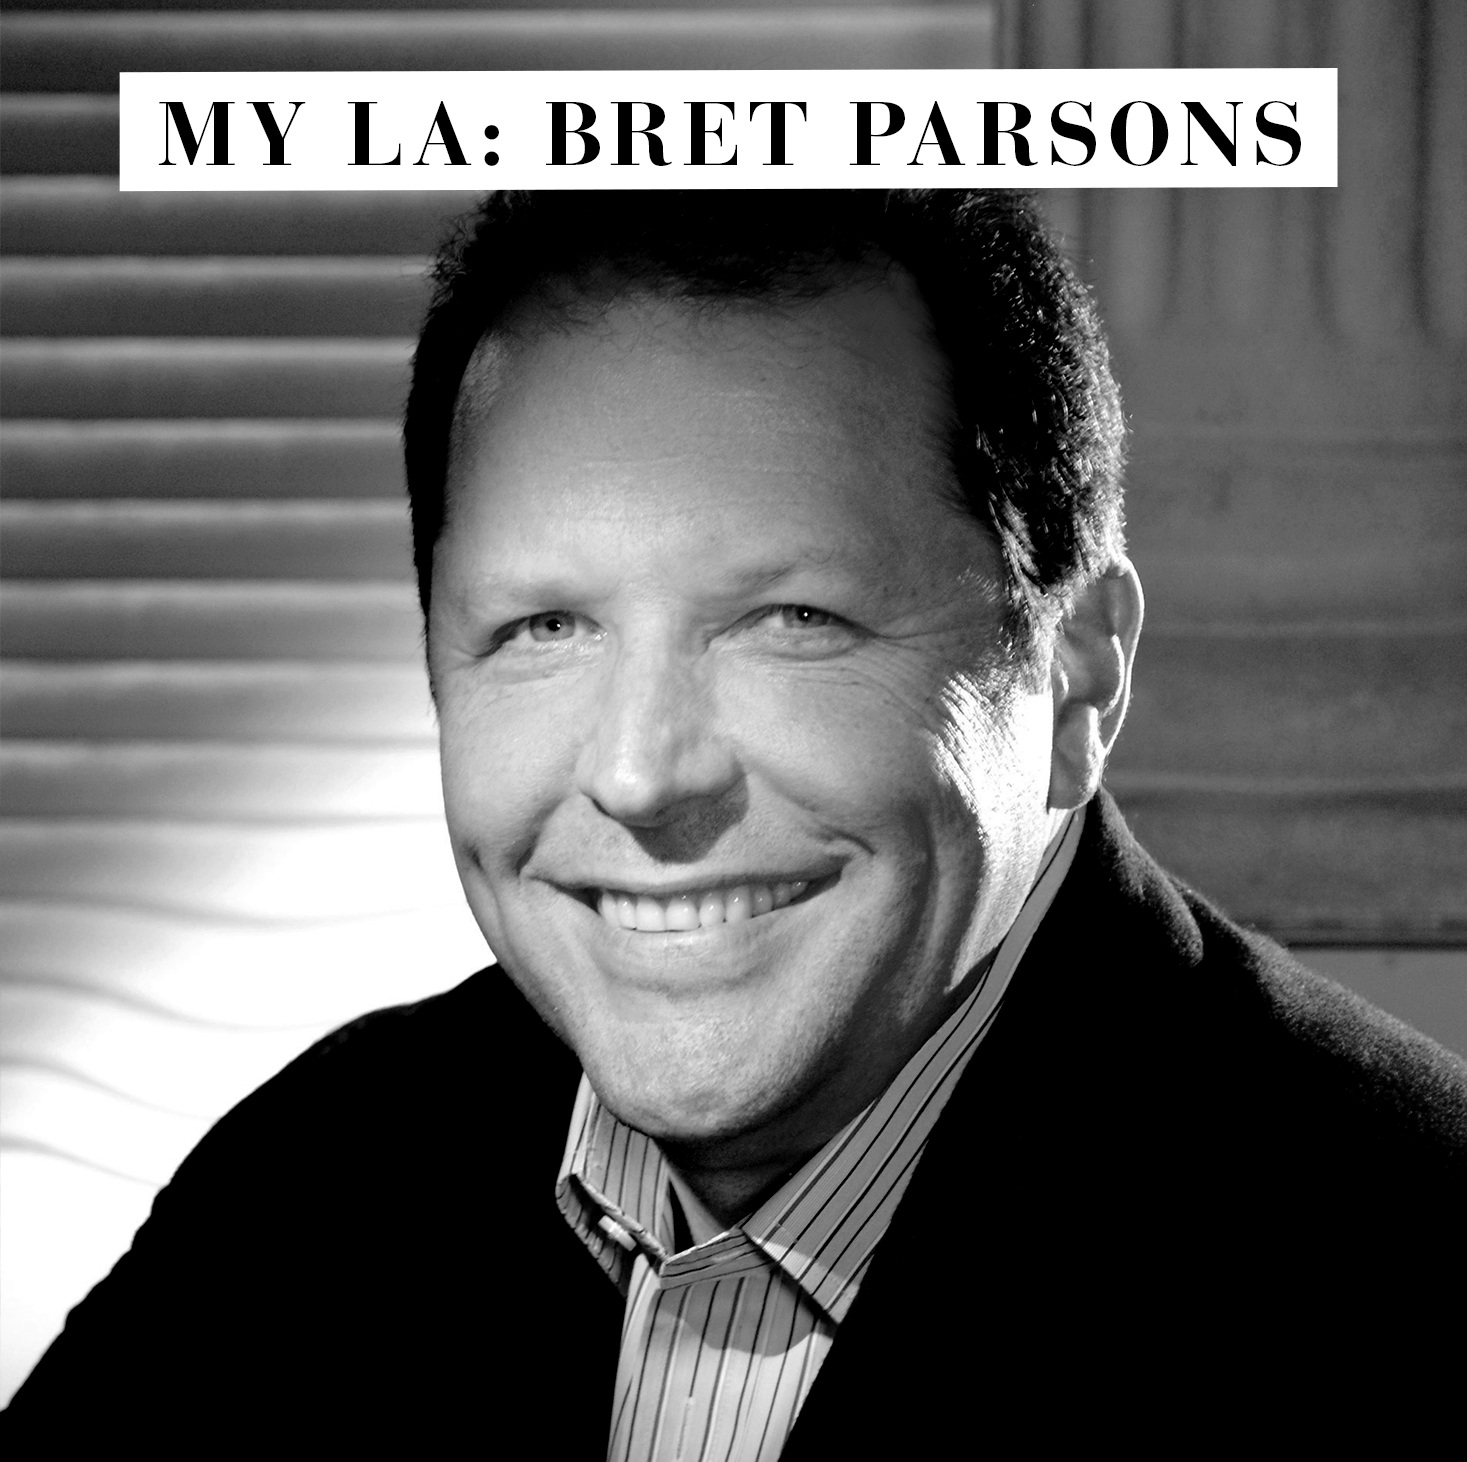 Bret_Parsons_MyLA.jpg